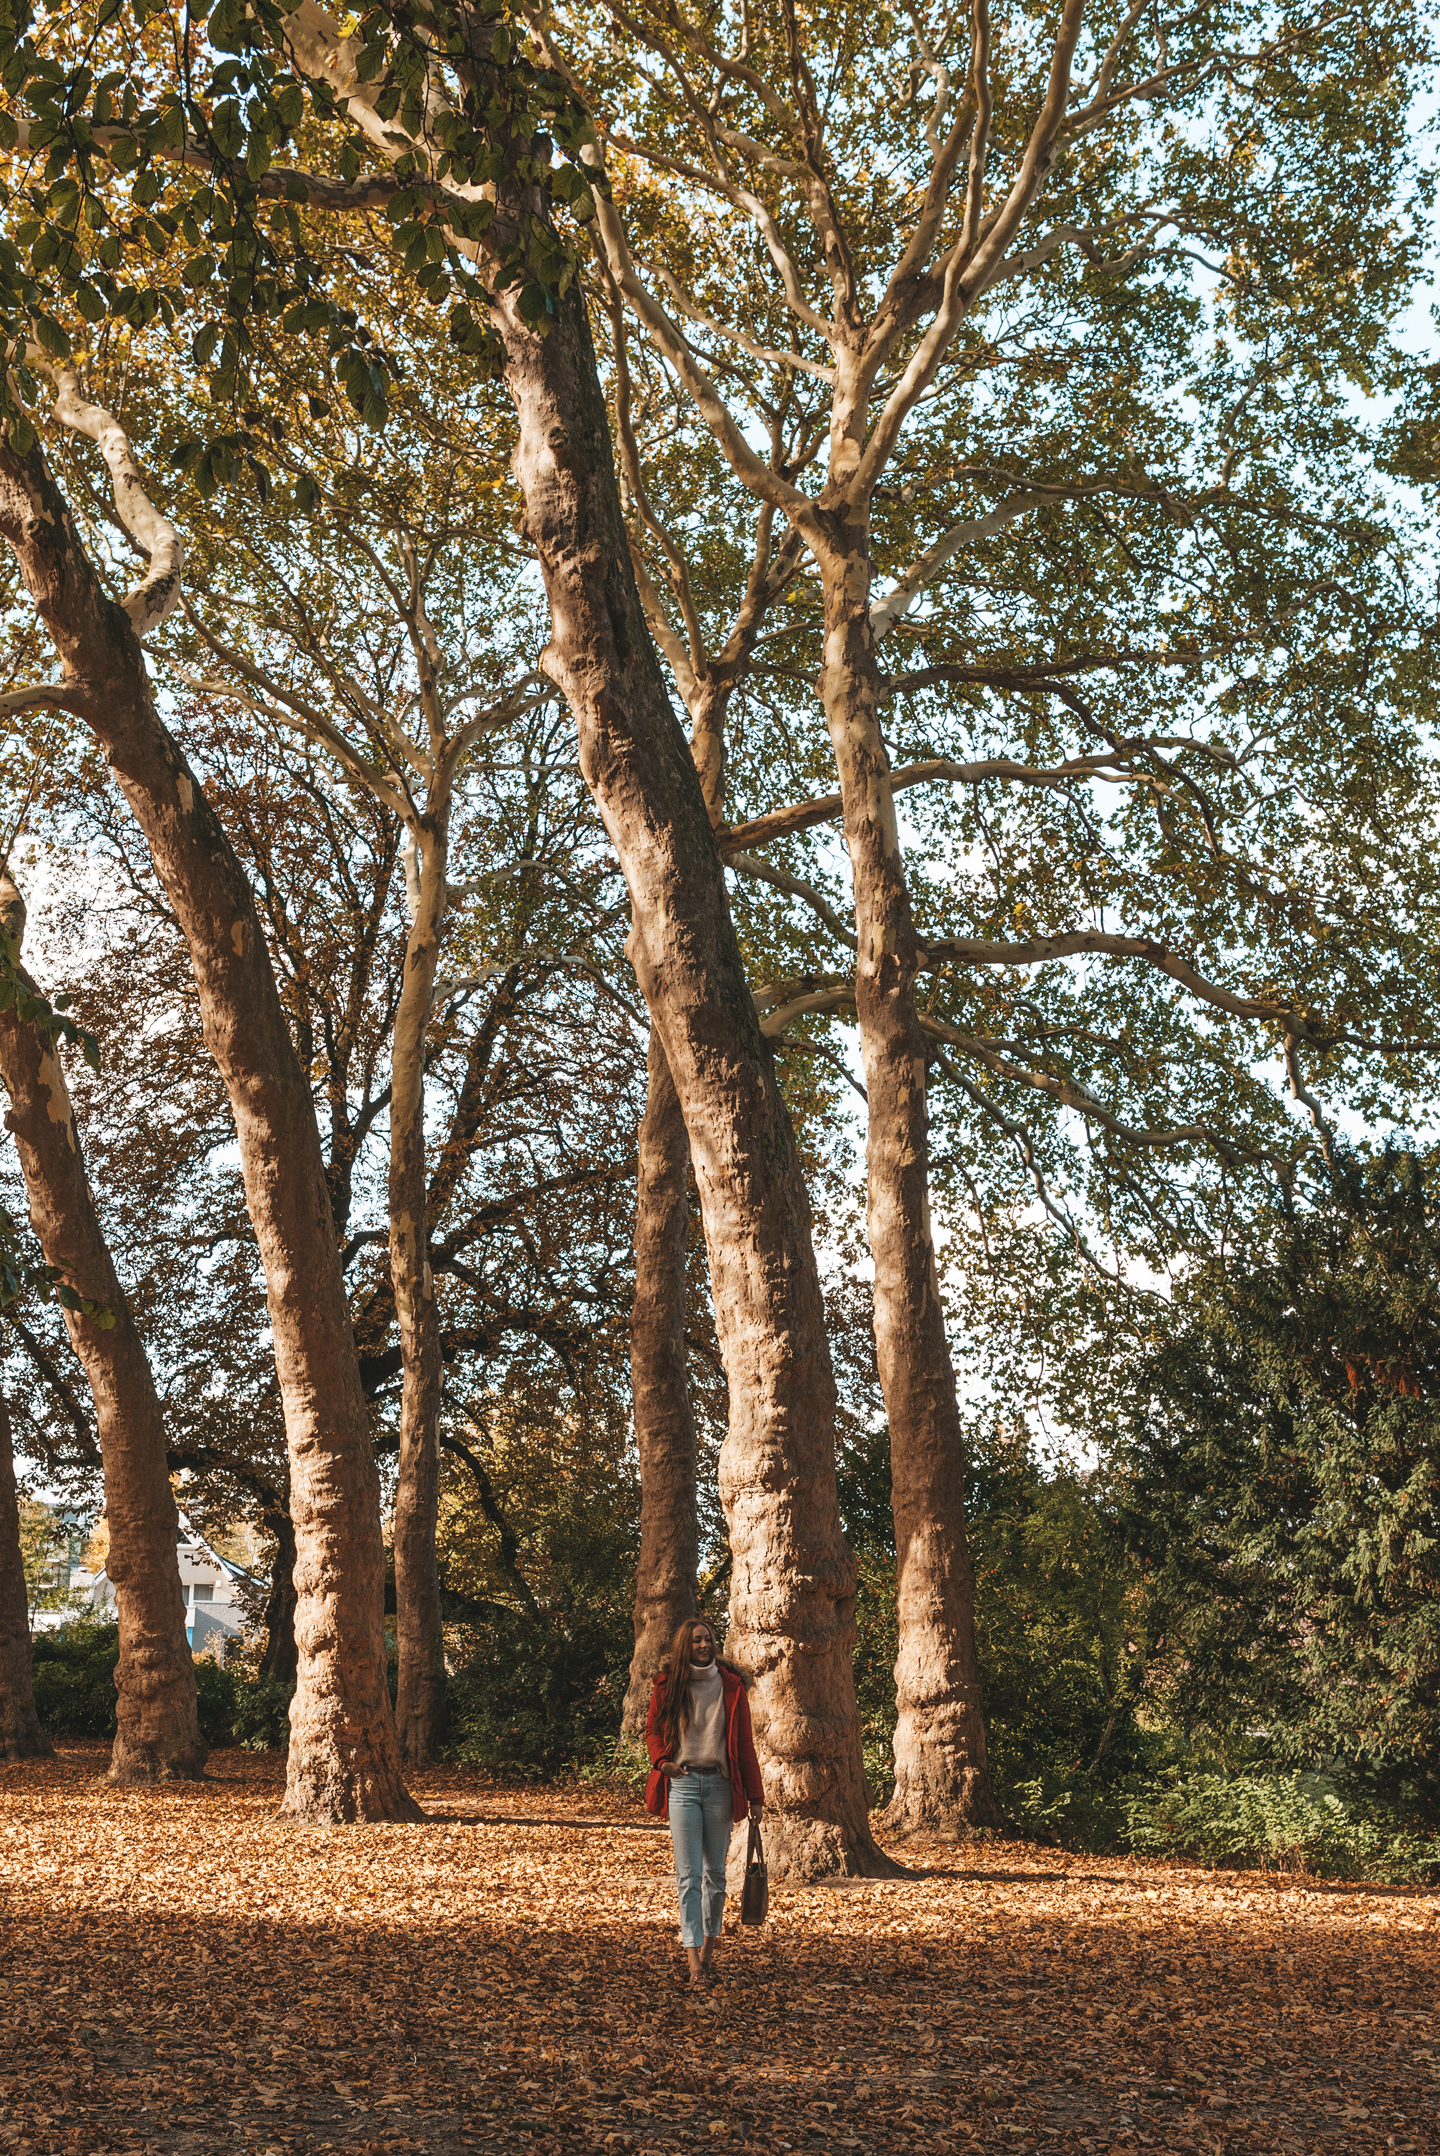 Style Italy winterjas dubbelsteynpark herfst Dordrecht